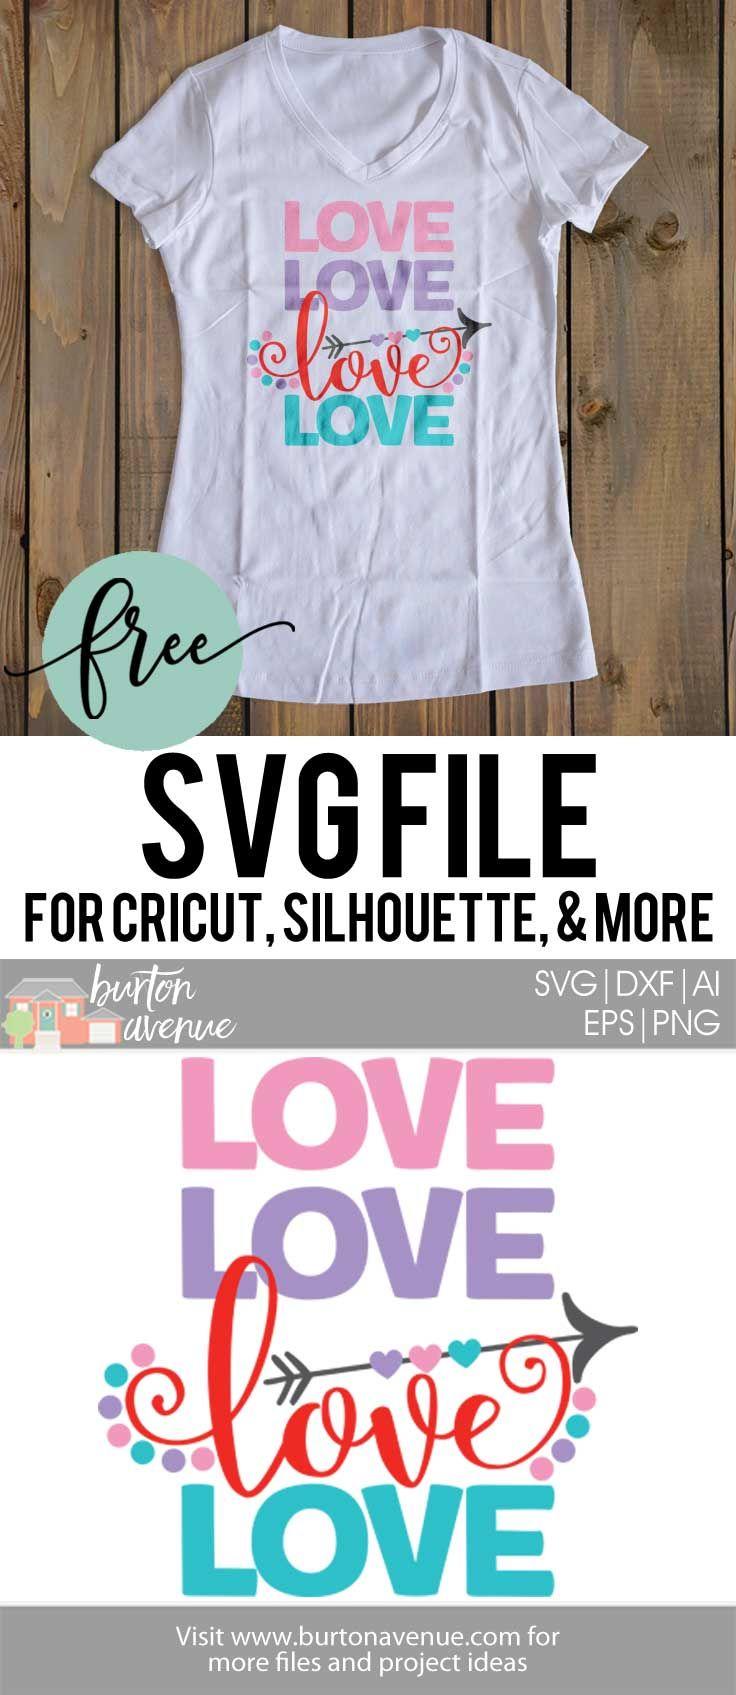 Flash Freebie} - Free SVG Cut File - Love Love Love Love